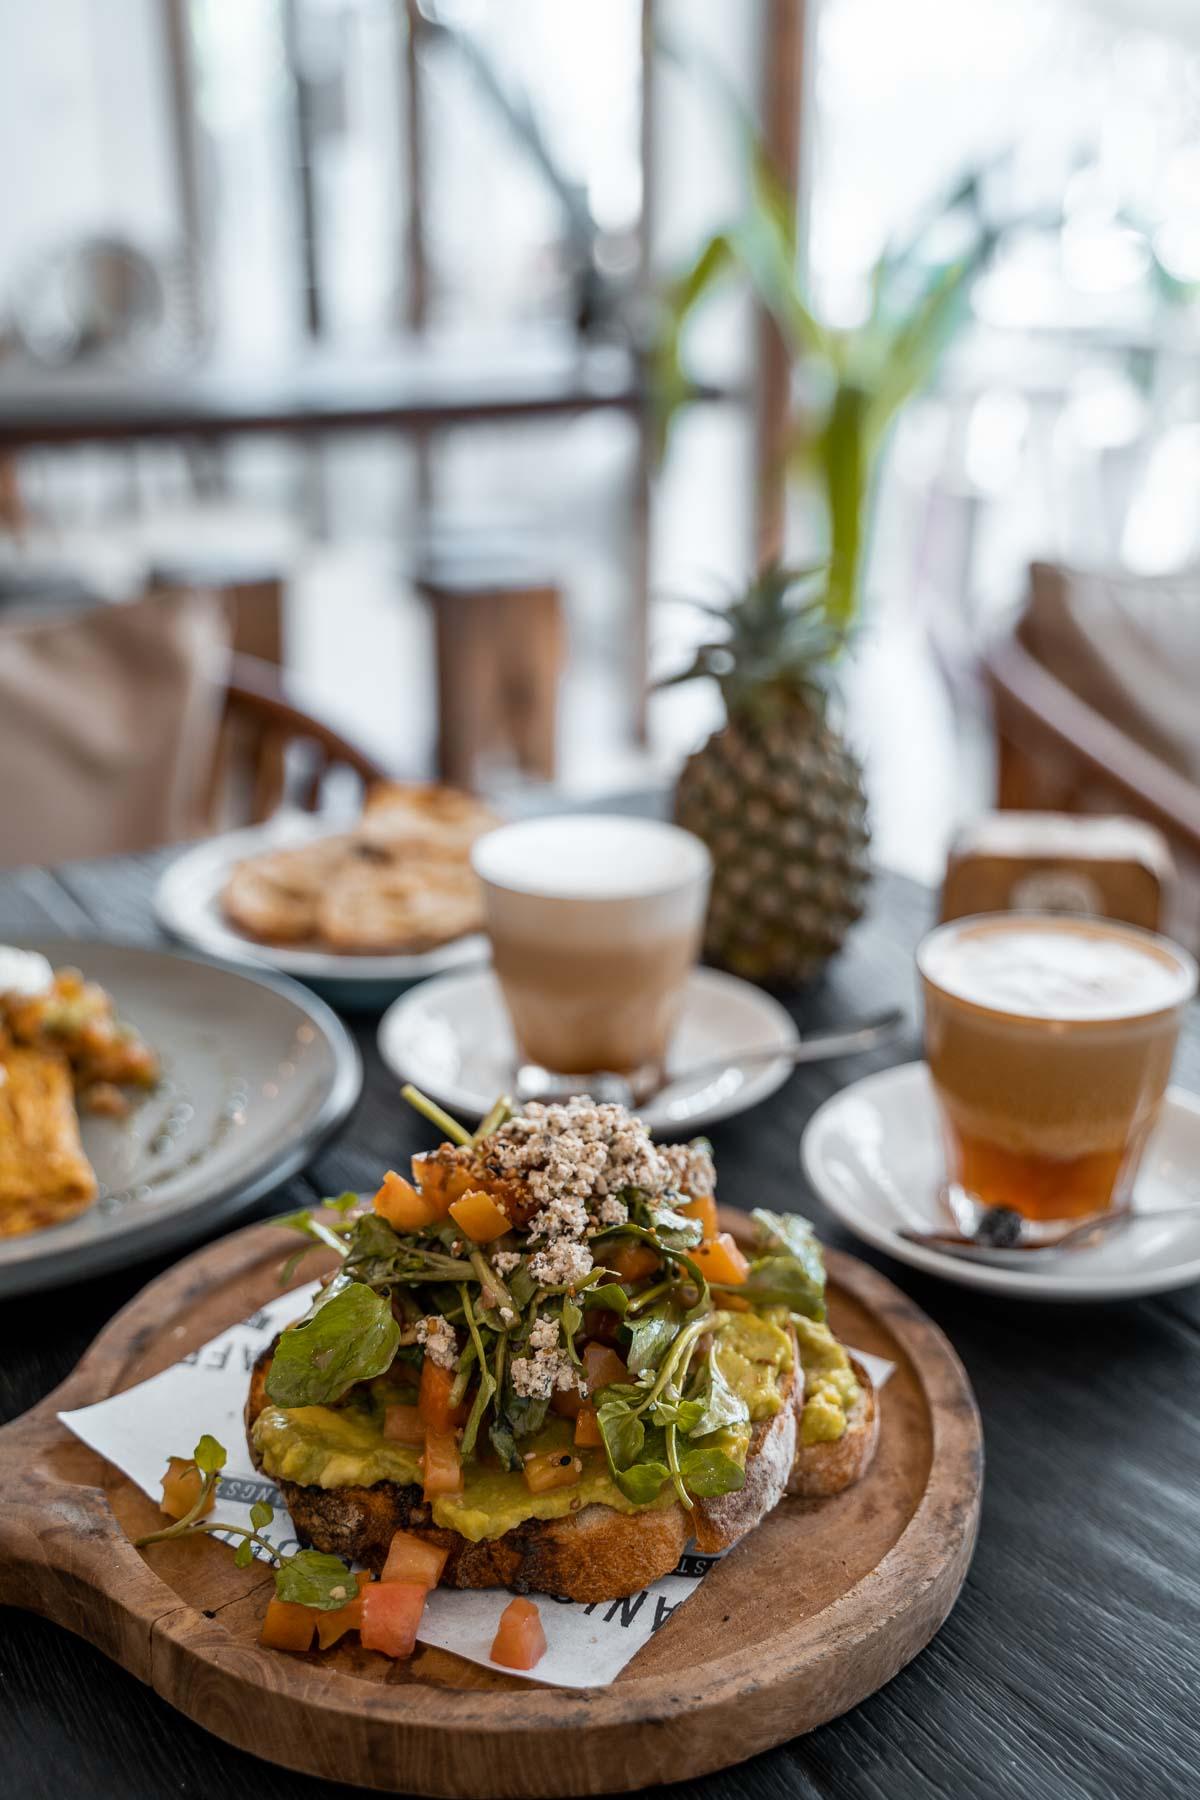 Breakfast with avocado toast at Cafe Organic in Canggu, Bali